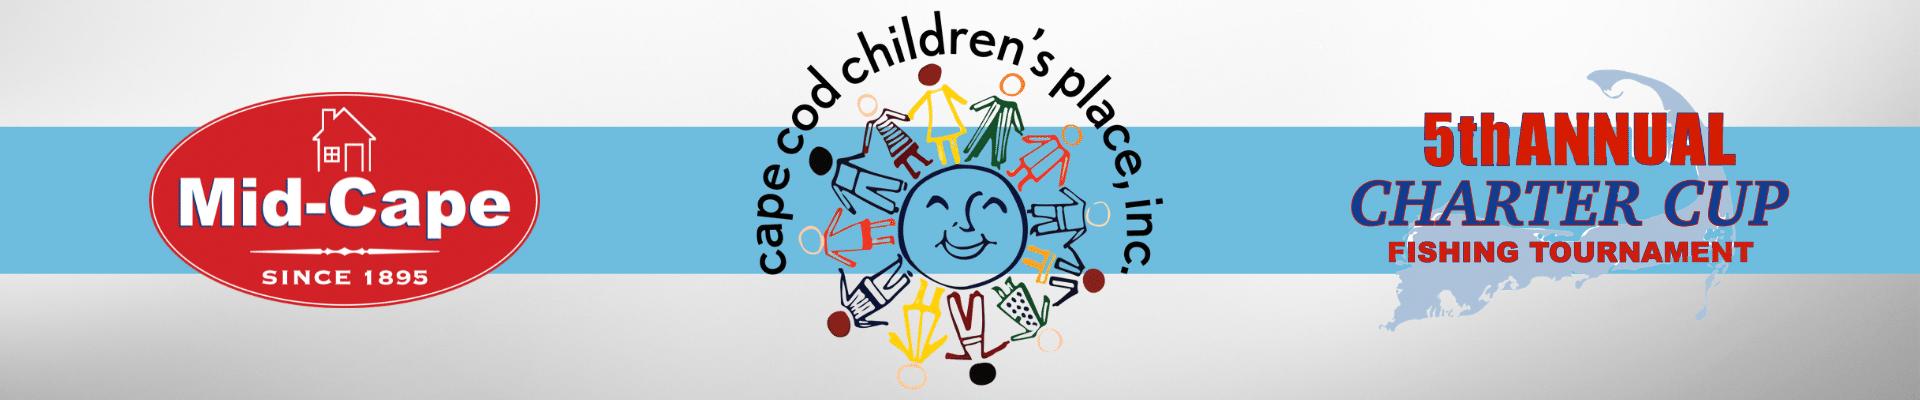 Support Cape Cod Children's Place